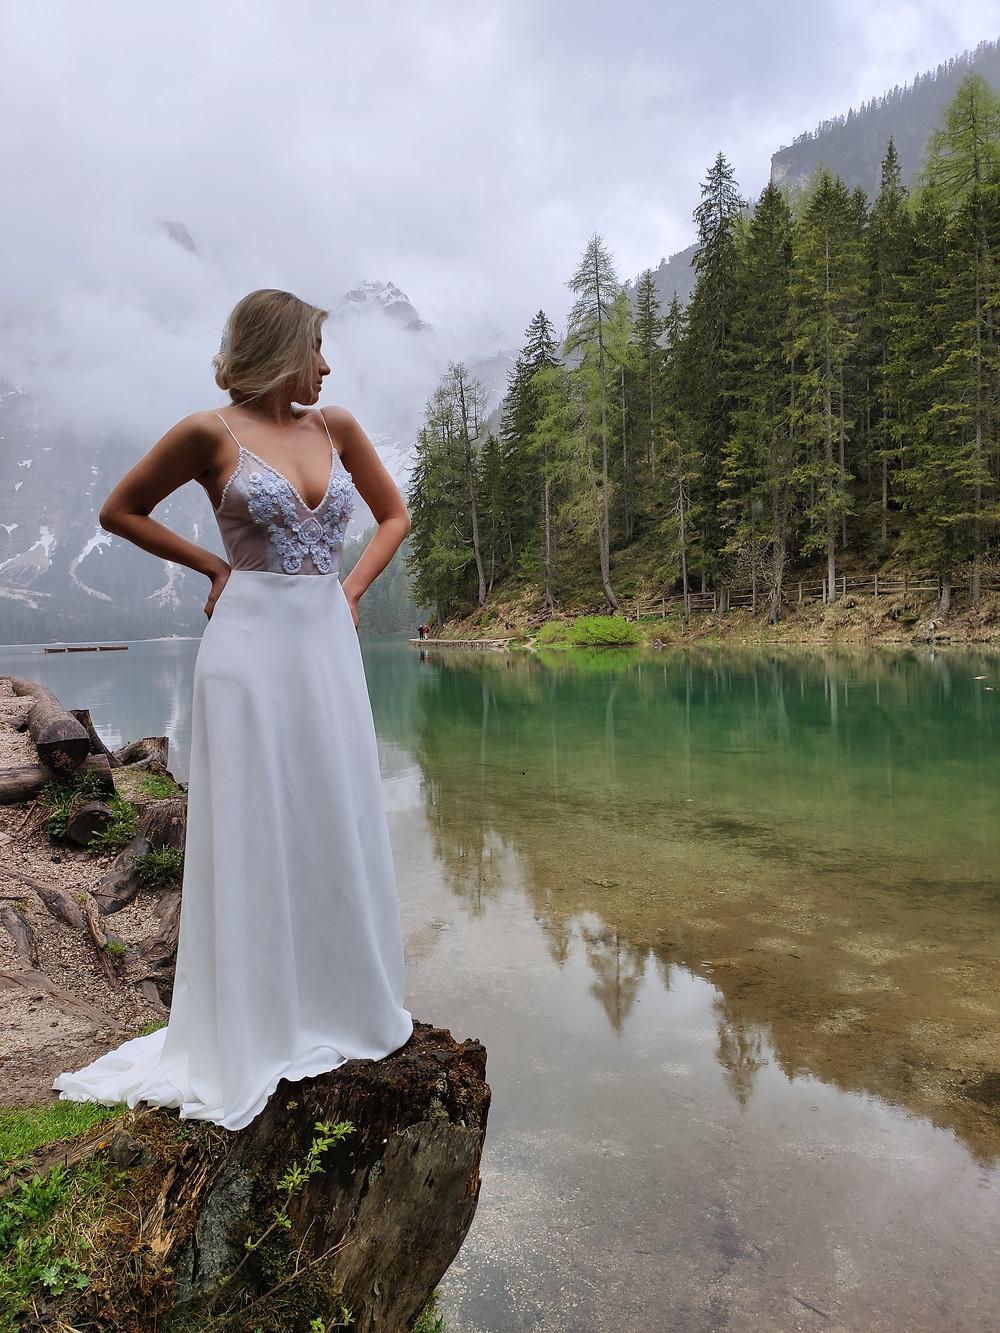 Modelo: Manu Dequigiovanni. Local: Lago Di Braies (Itália)